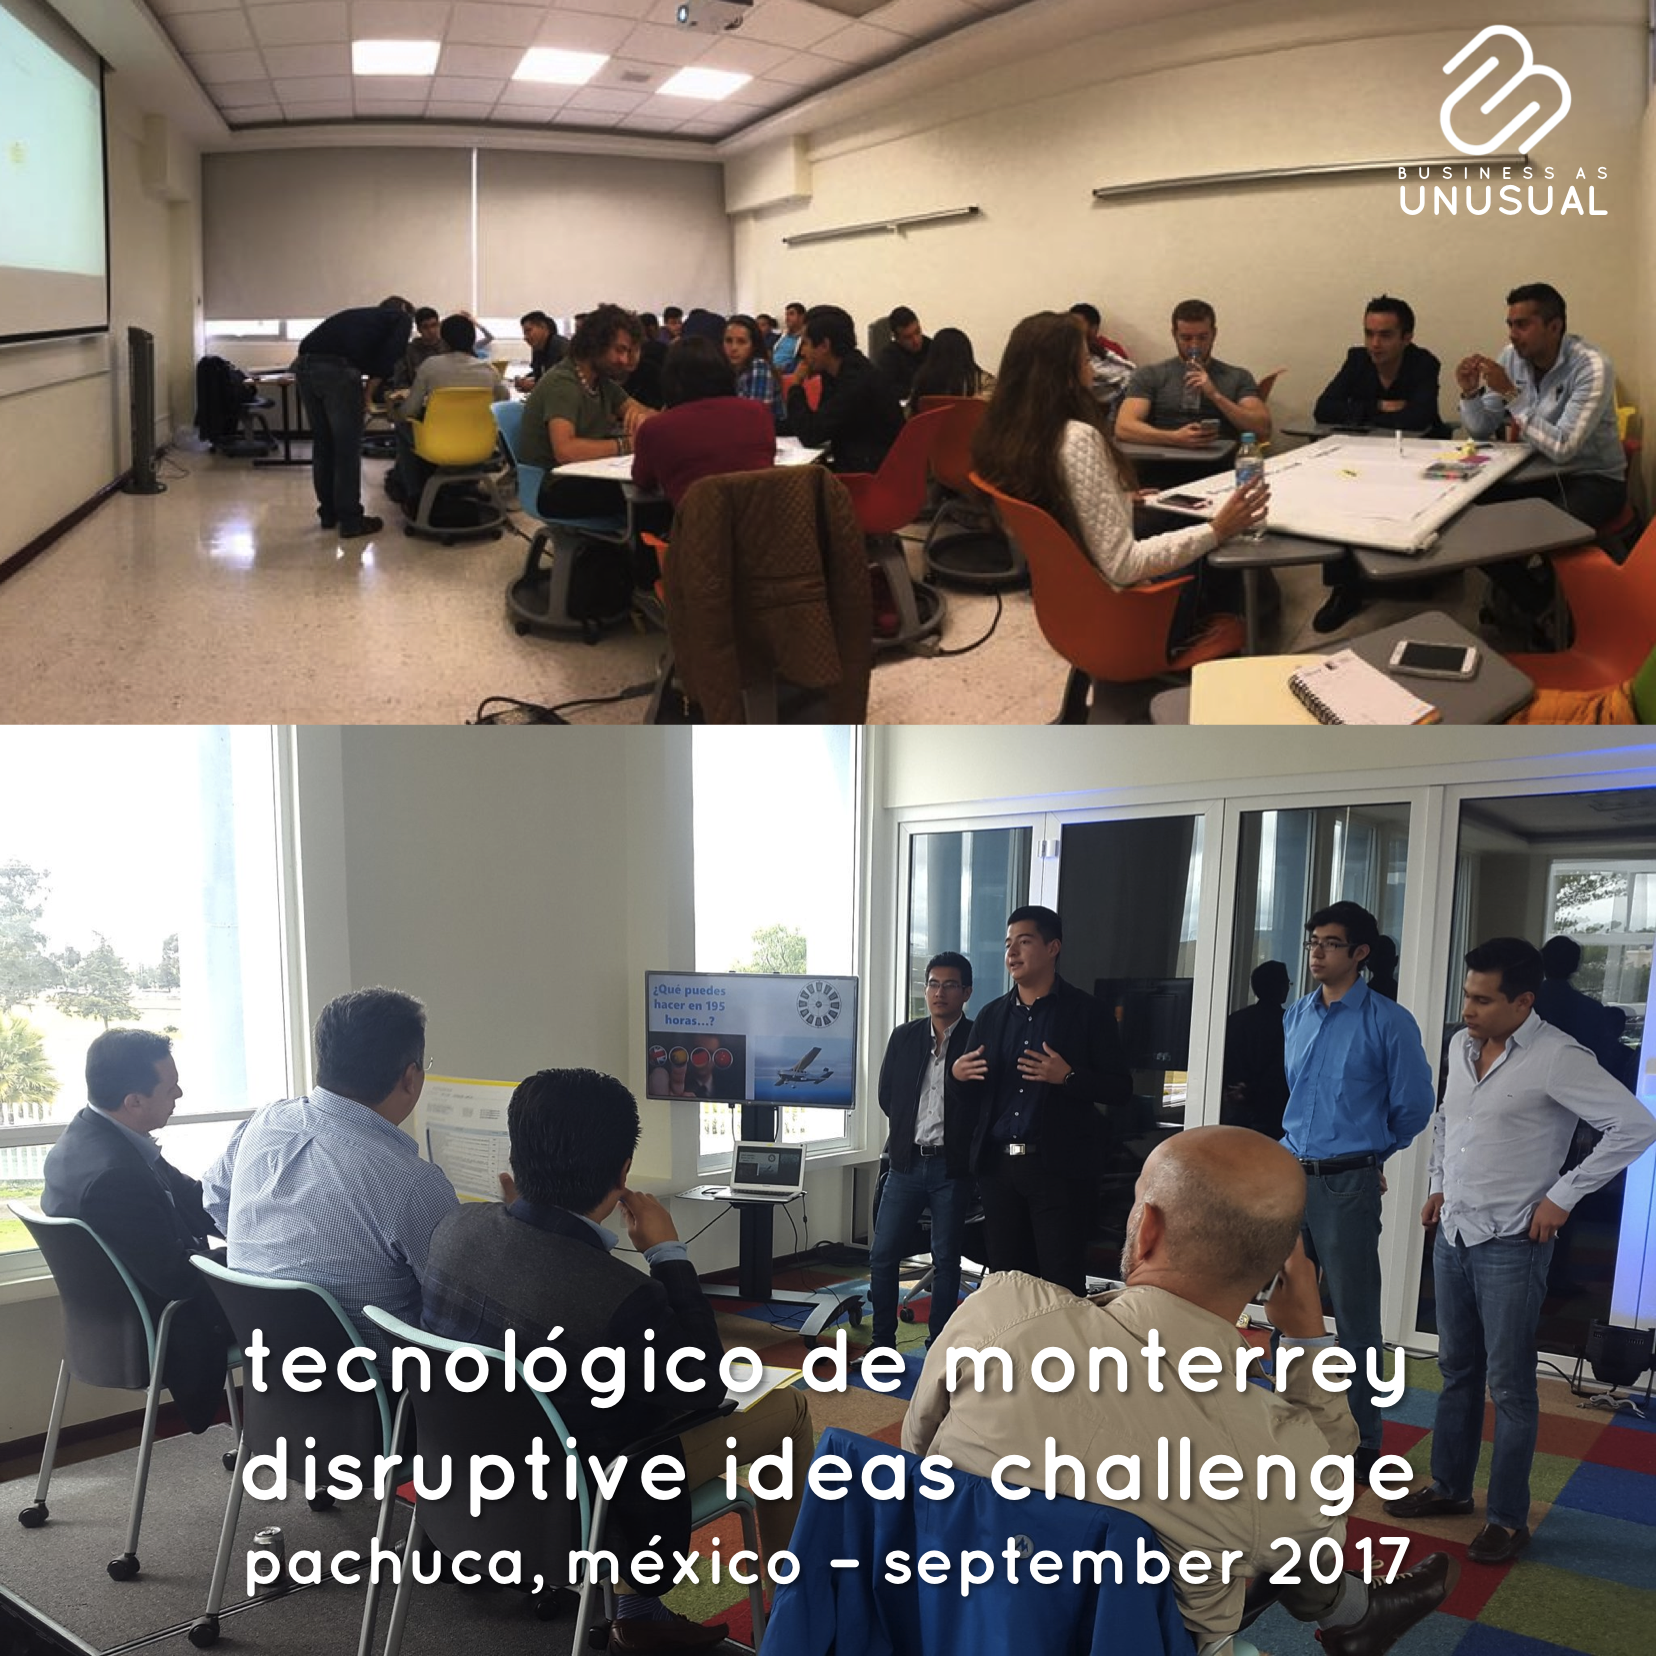 Instituto Tecnológico de Monterrey - Semana i - Disruptive Ideas Challenge - Pachuca 2017